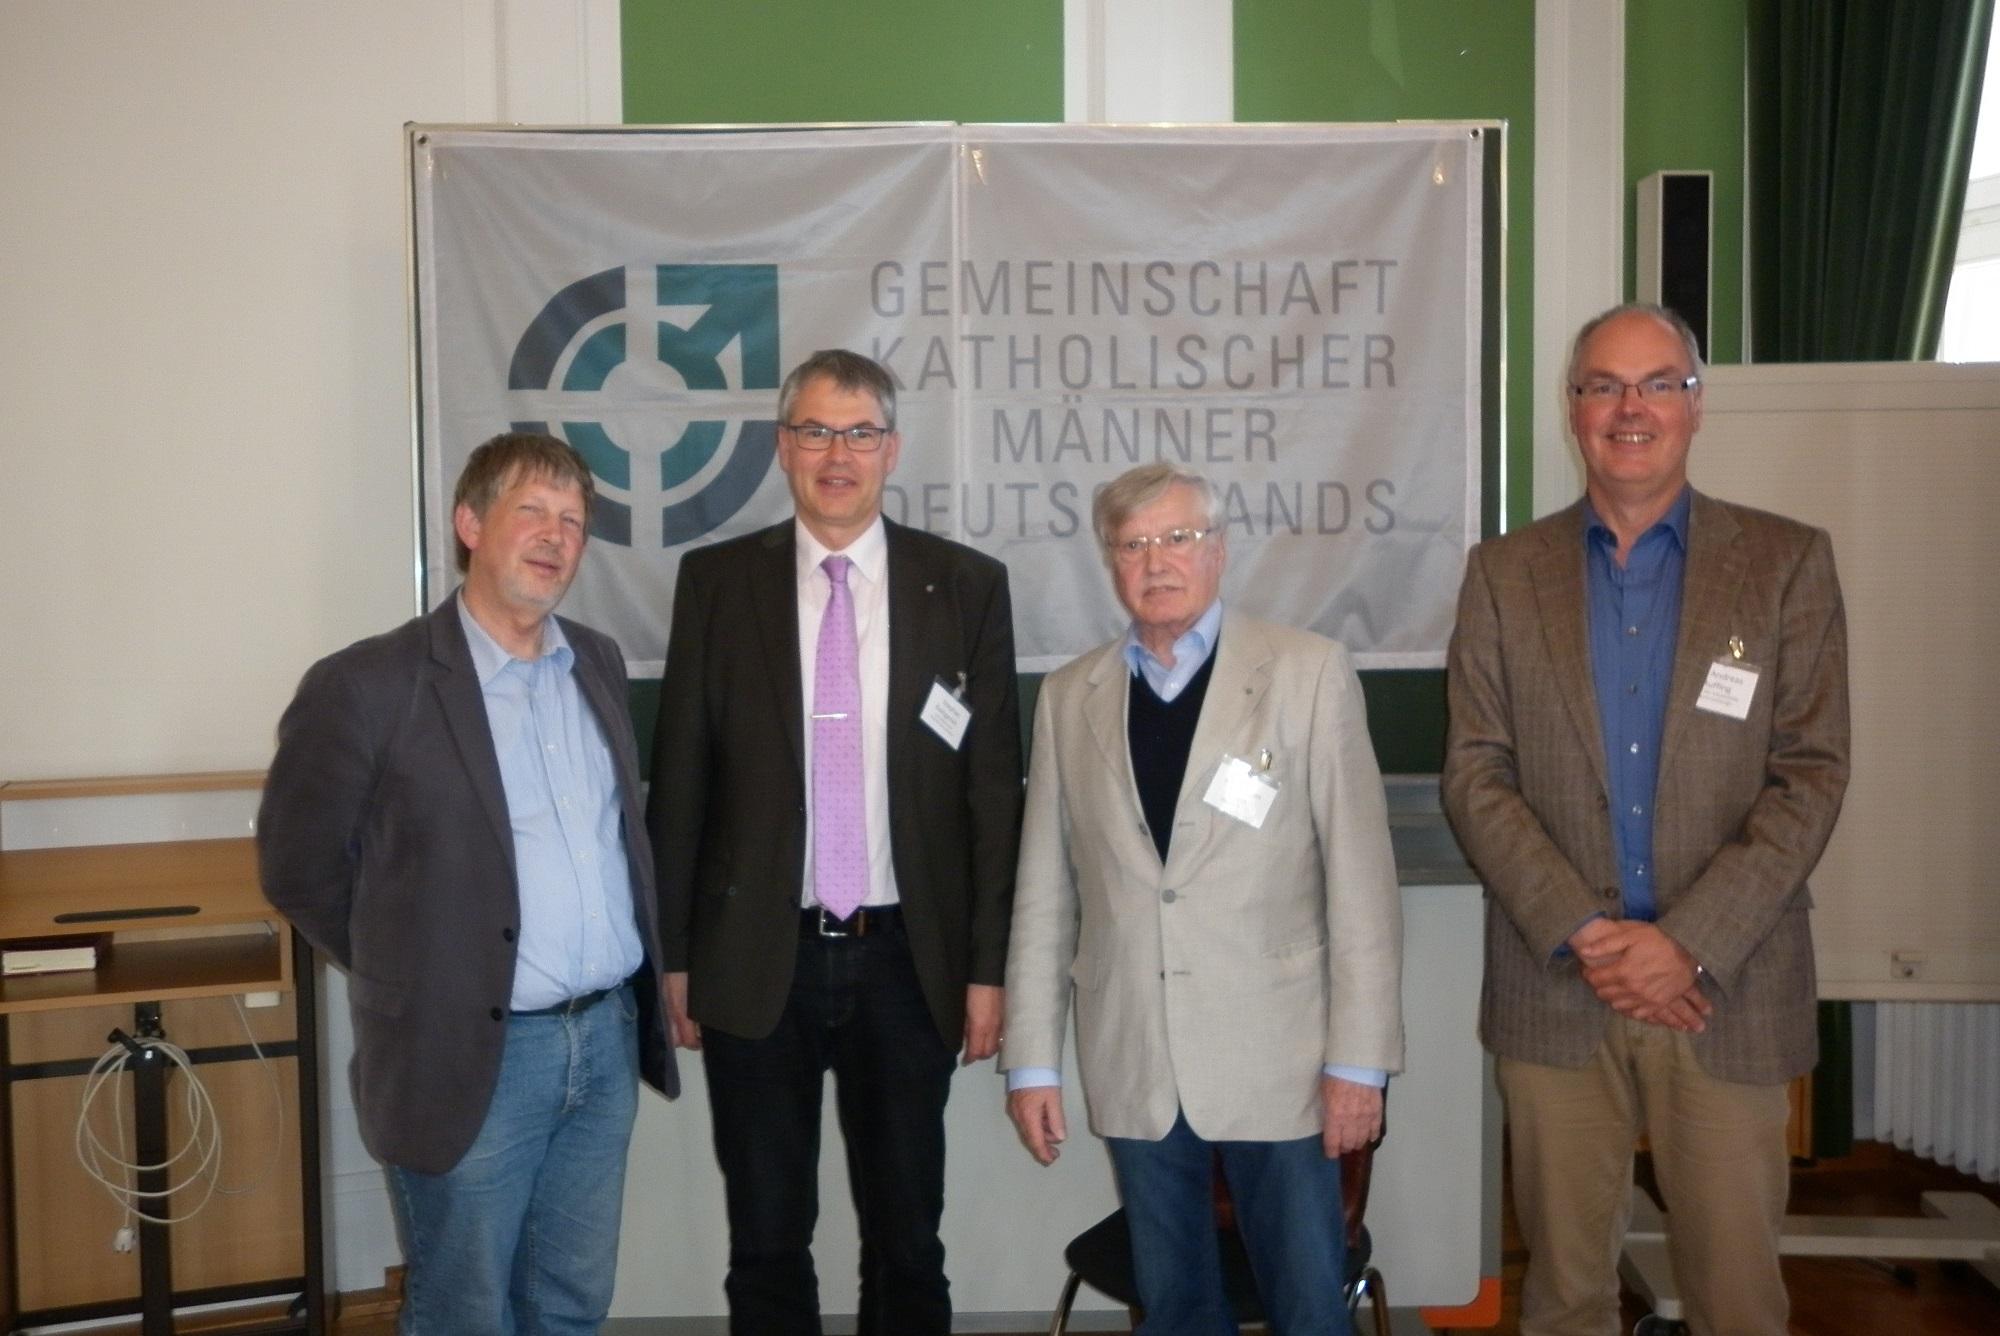 v.l.n.r.: Norbert Hendriks (e.V.-Vorstandsmitglied), Stephan Buttgereit, Oberst a.D. Karl-Jürgen Klein, Andreas Ruffing (Leiter der Arbeitsstelle).